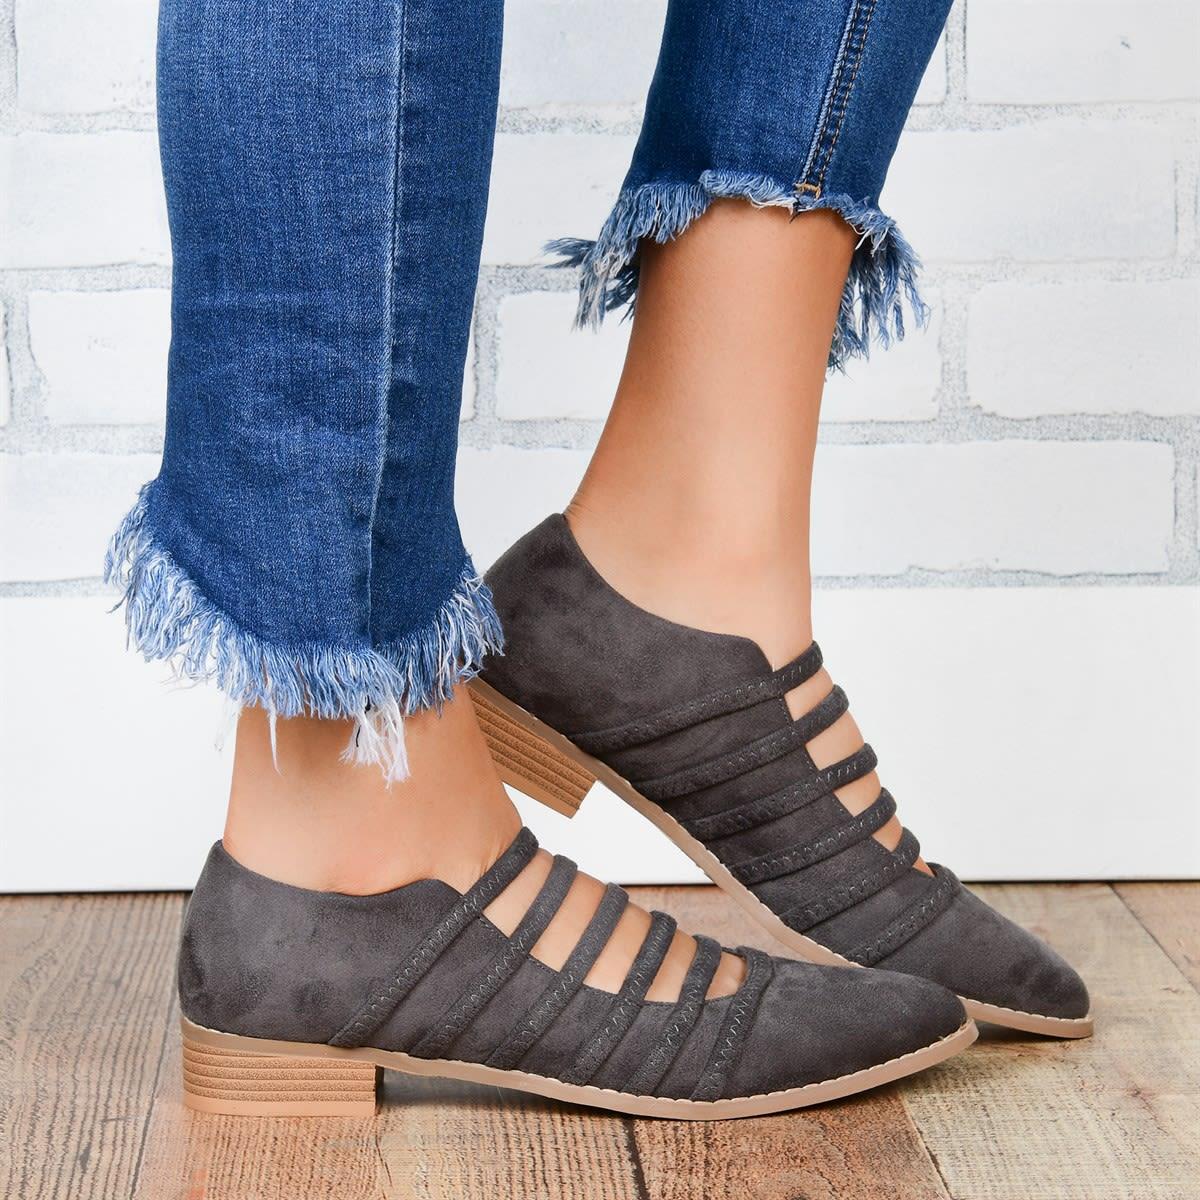 Strappy Almond Toe Flats